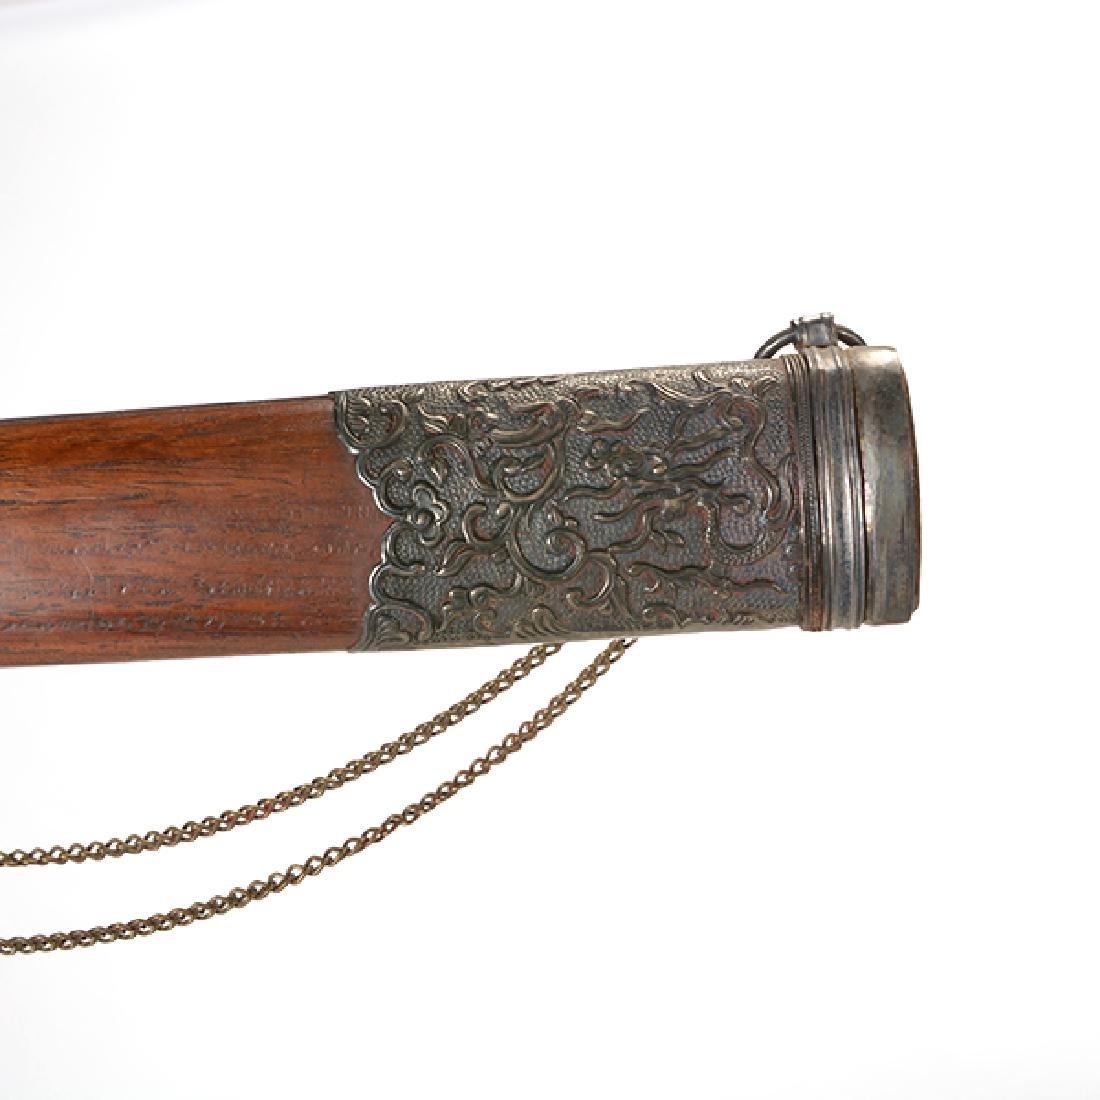 A Tibetan Ceremonial Sword, 19th Century - 10